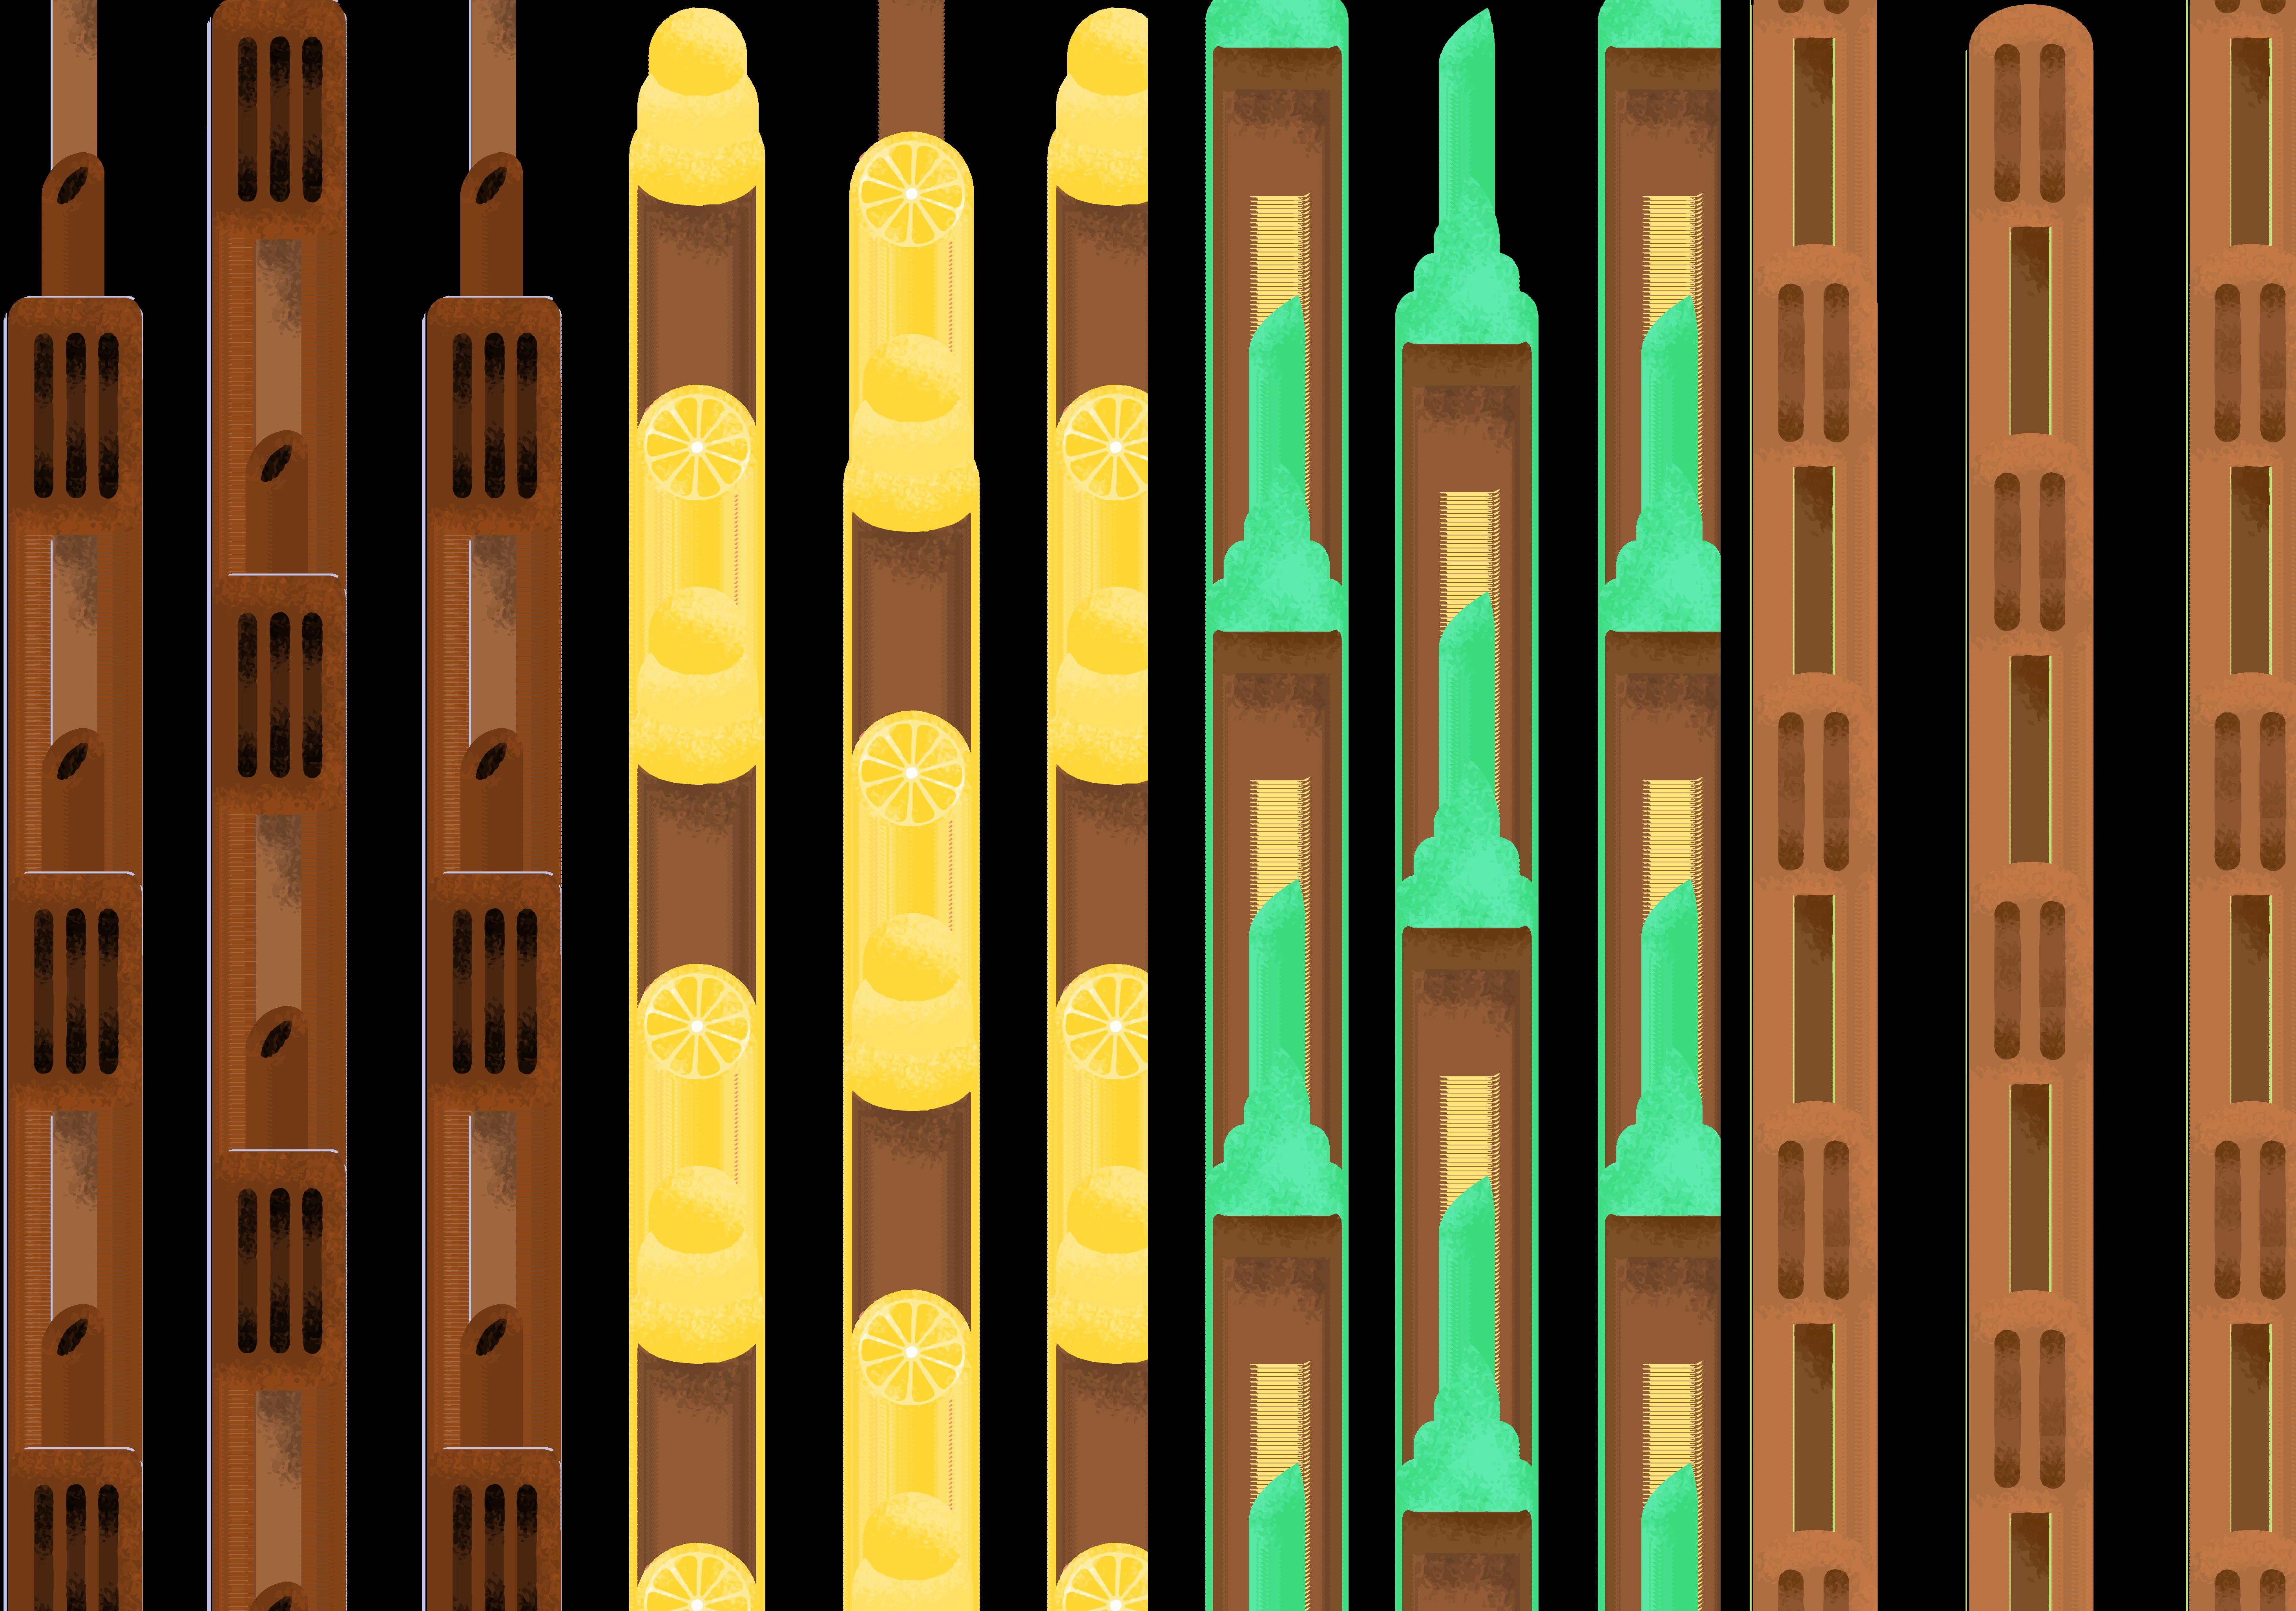 Ice clipart pattern design. Cream download wallpaper cold